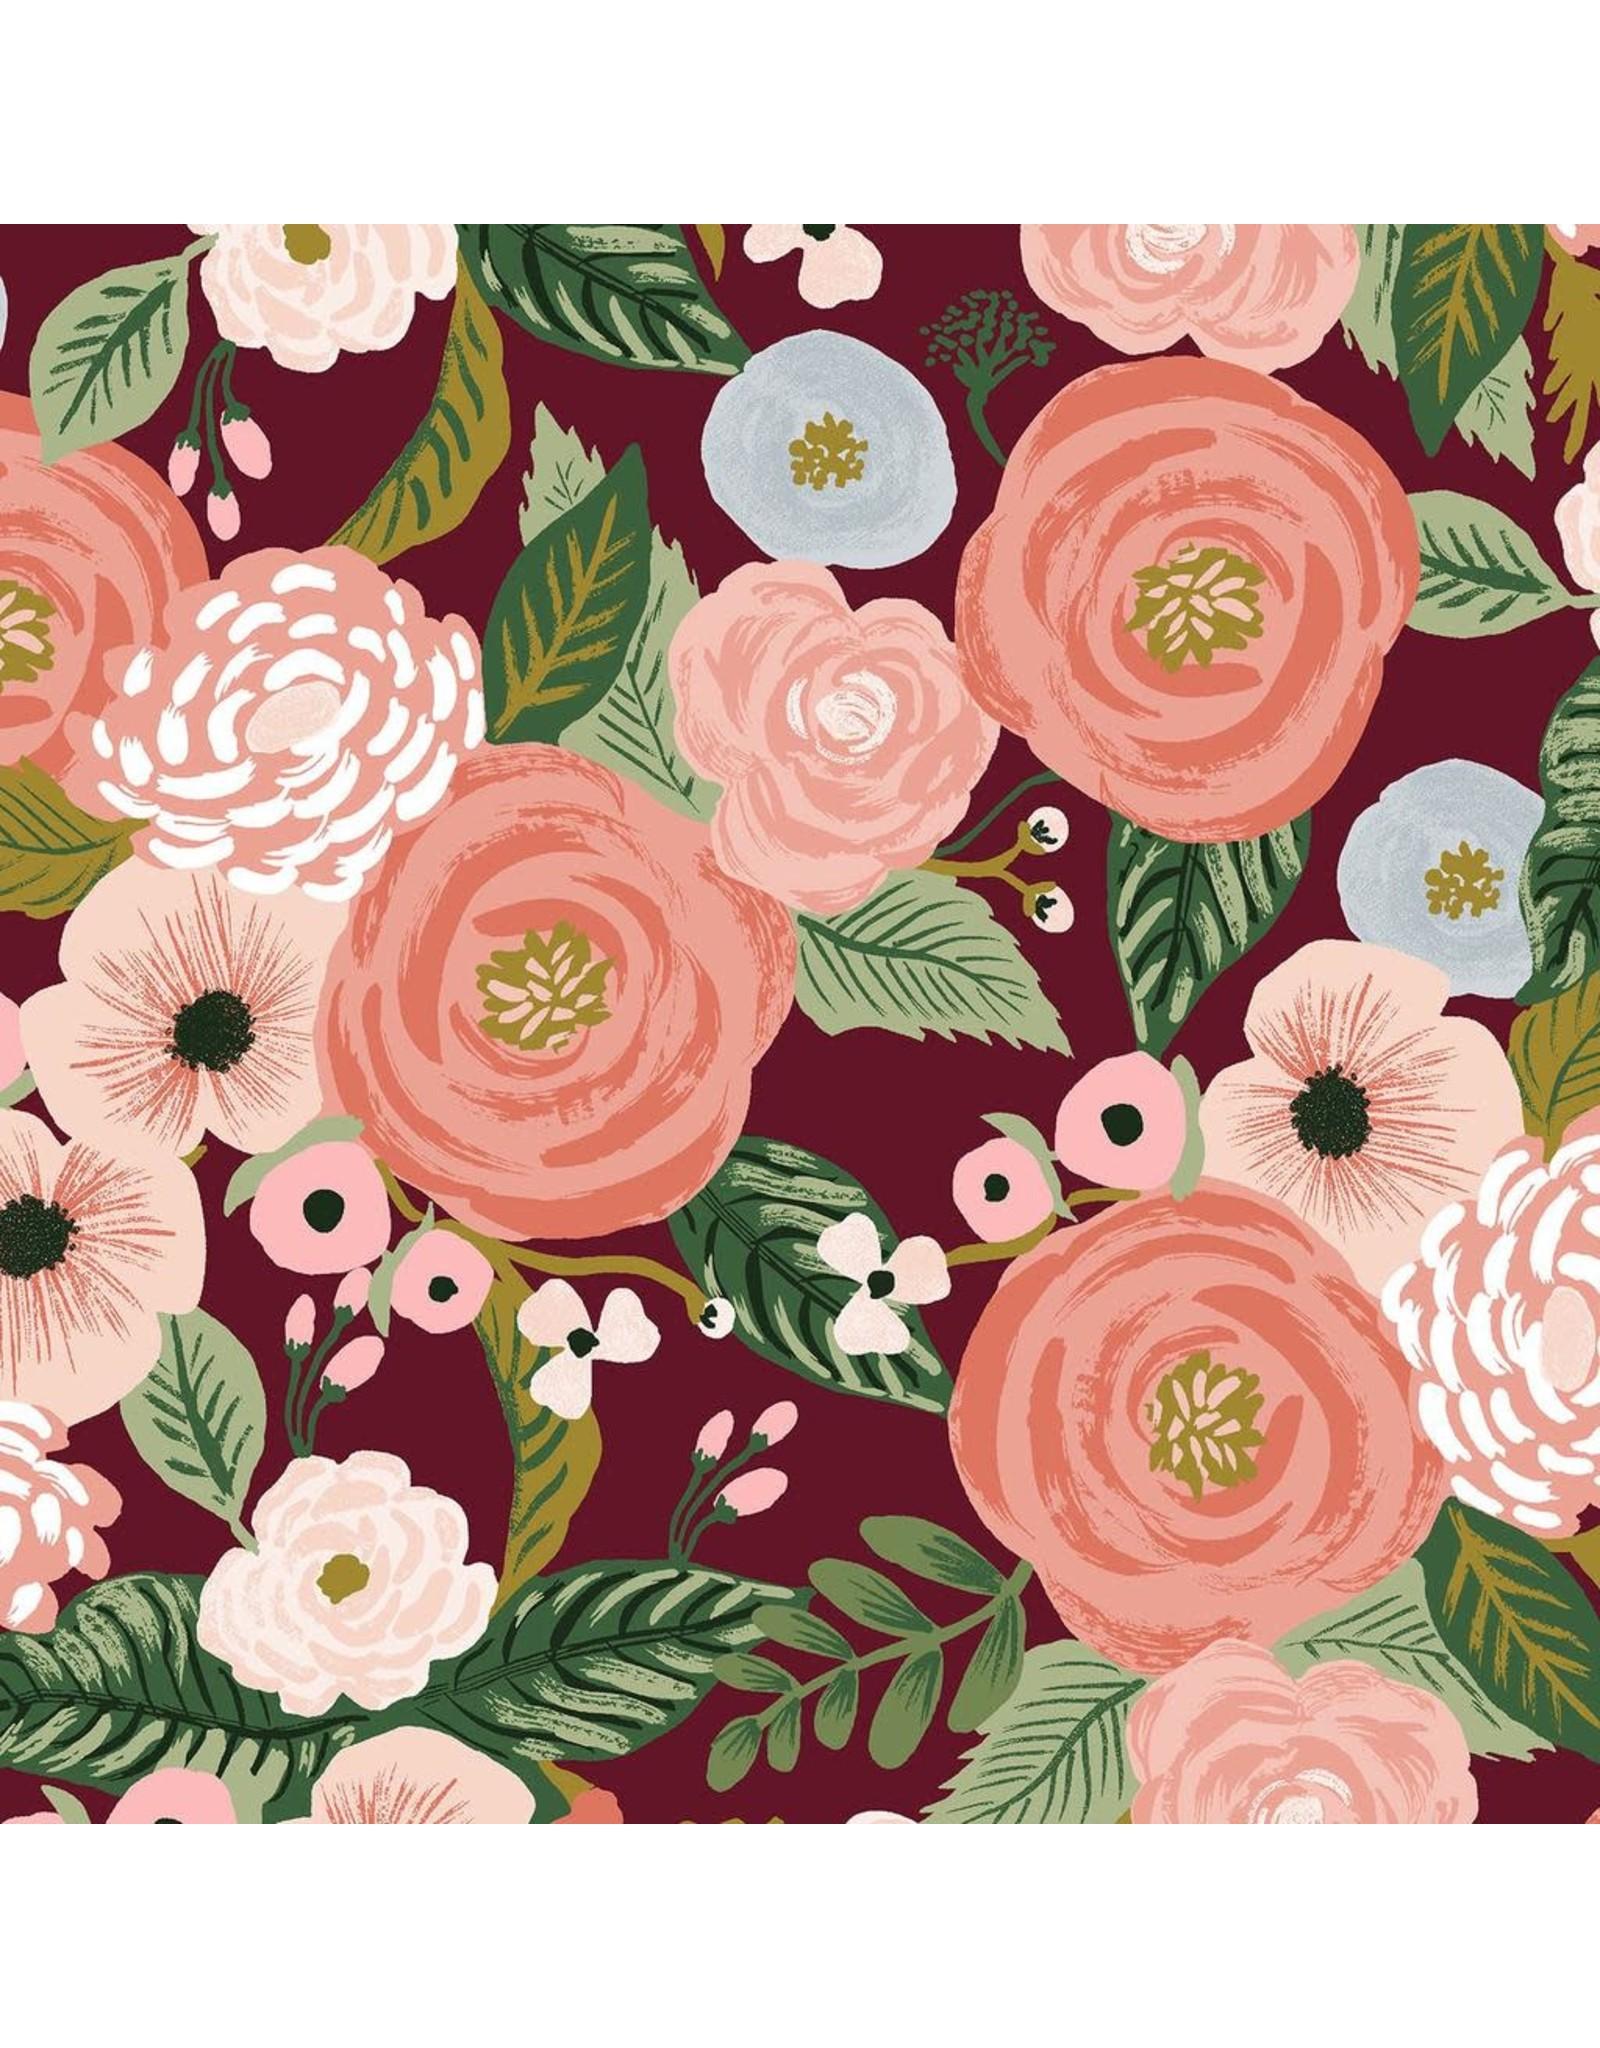 Rifle Paper Co. Linen/Cotton Canvas, Garden Party, Juliet Rose in Burgundy, Fabric Half-Yards RP520-BU1C